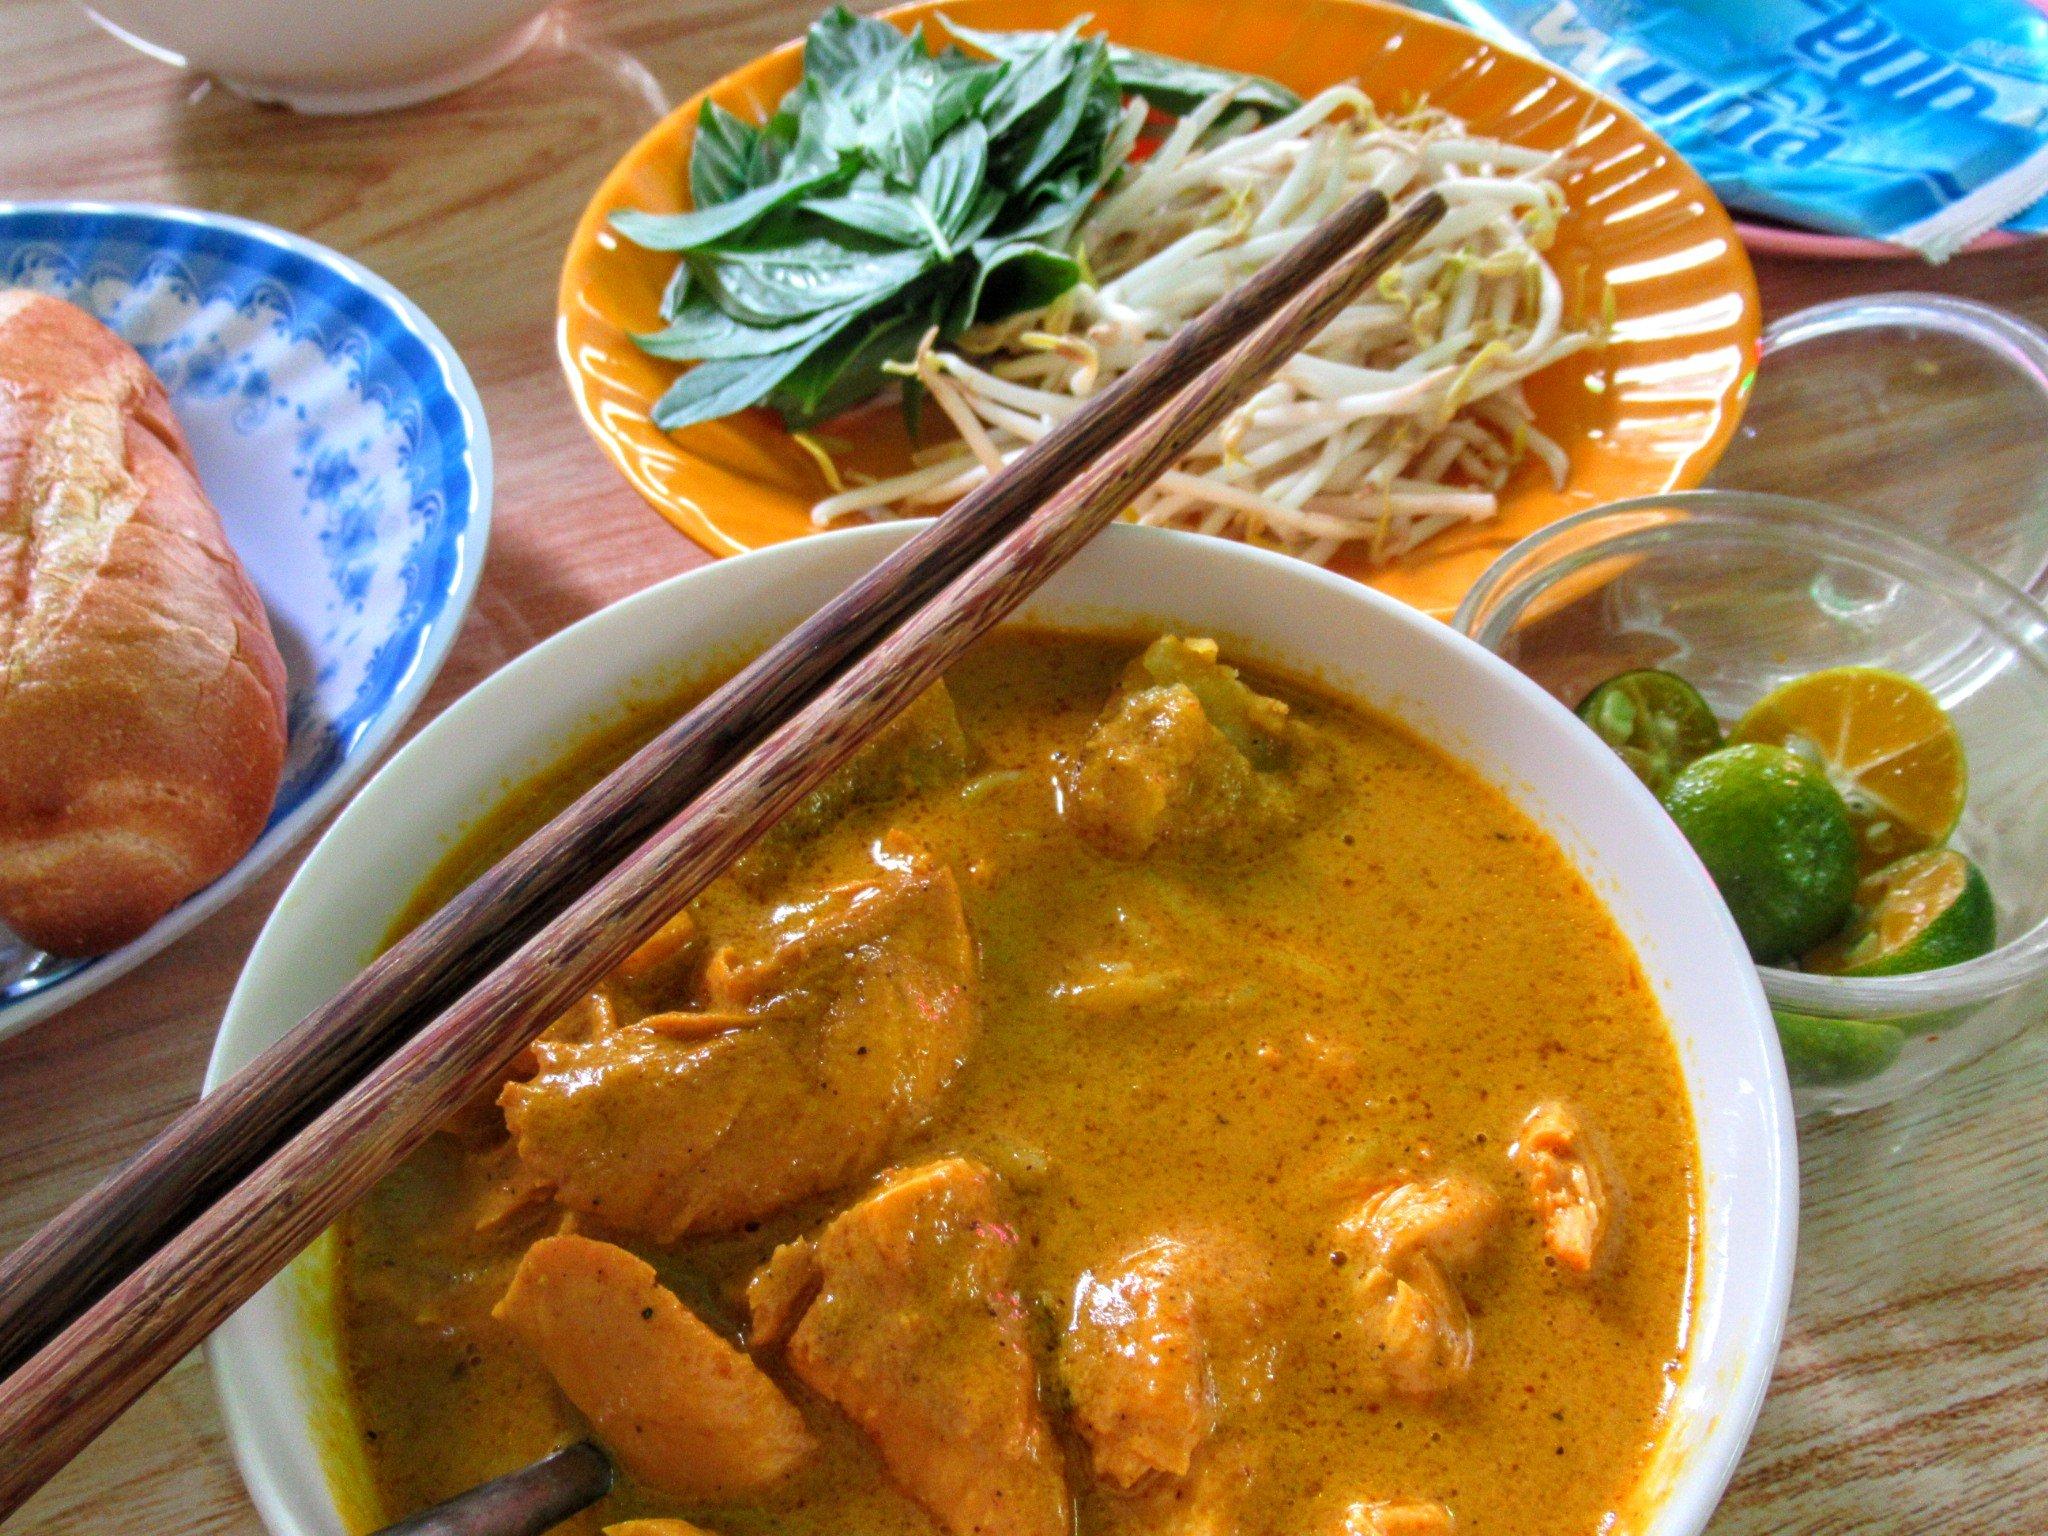 Ngoc Han curry house, Saigon, Ho Chi Minh City, Vietnam